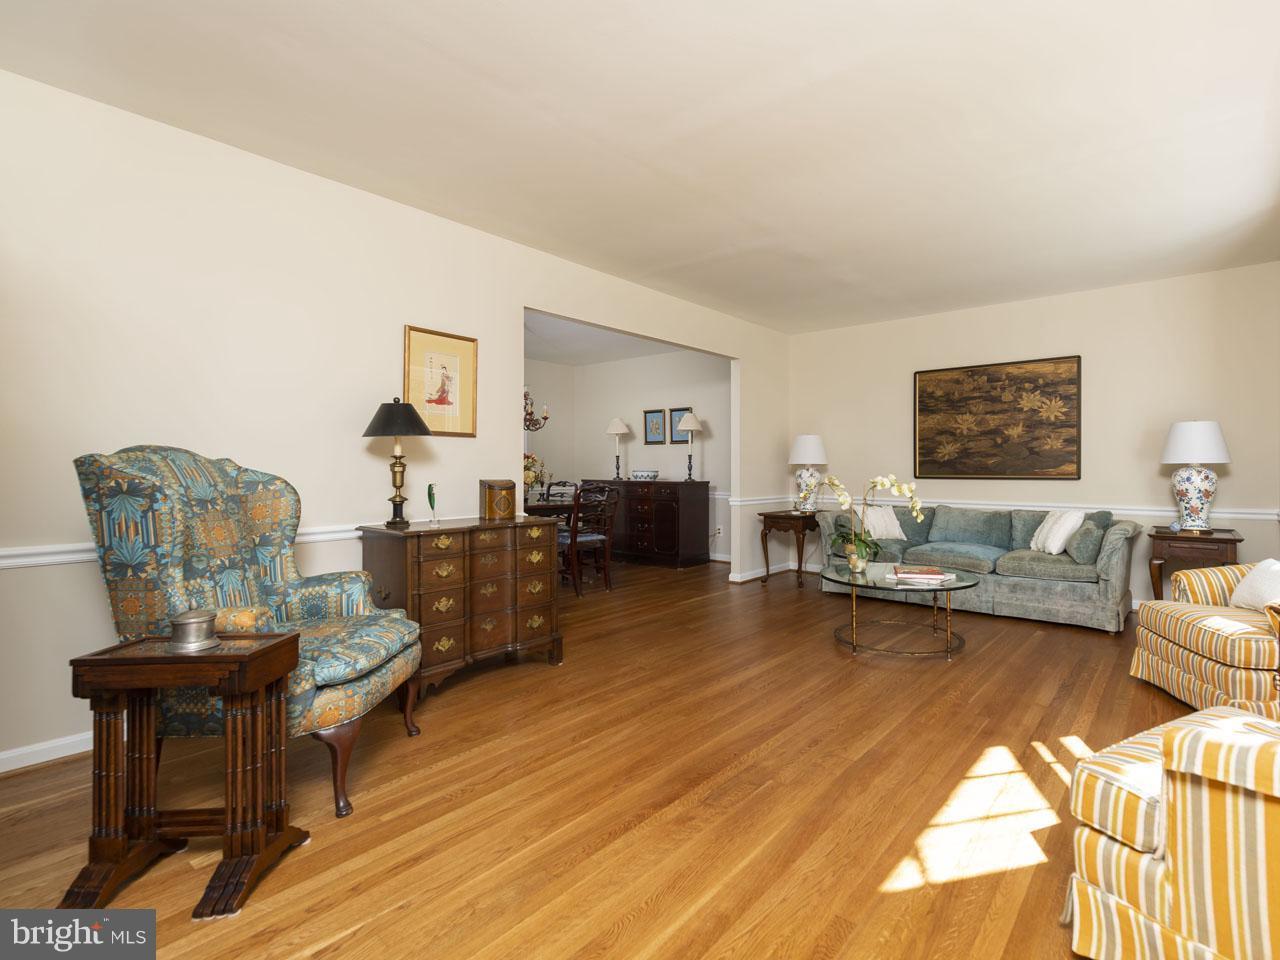 1010014728-300953035184-2021-09-05-13-50-24  |   | Annandale Delaware Real Estate For Sale | MLS# 1010014728  - Best of Northern Virginia